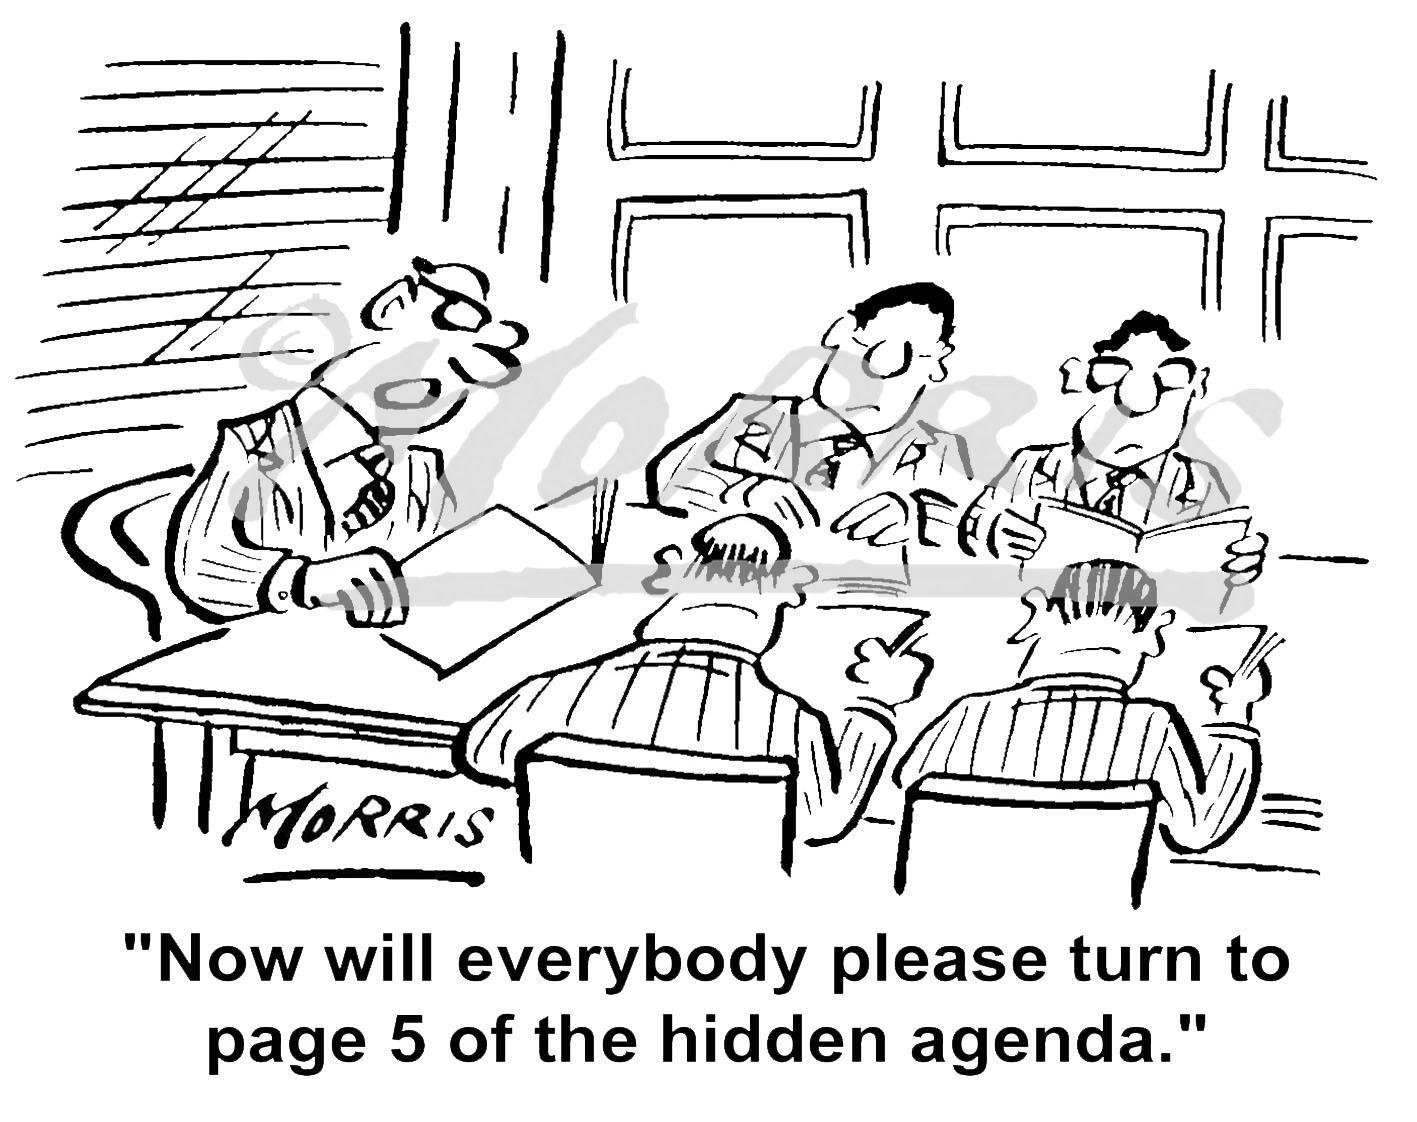 Boardroom agenda meeting cartoon – Ref: 3215bw